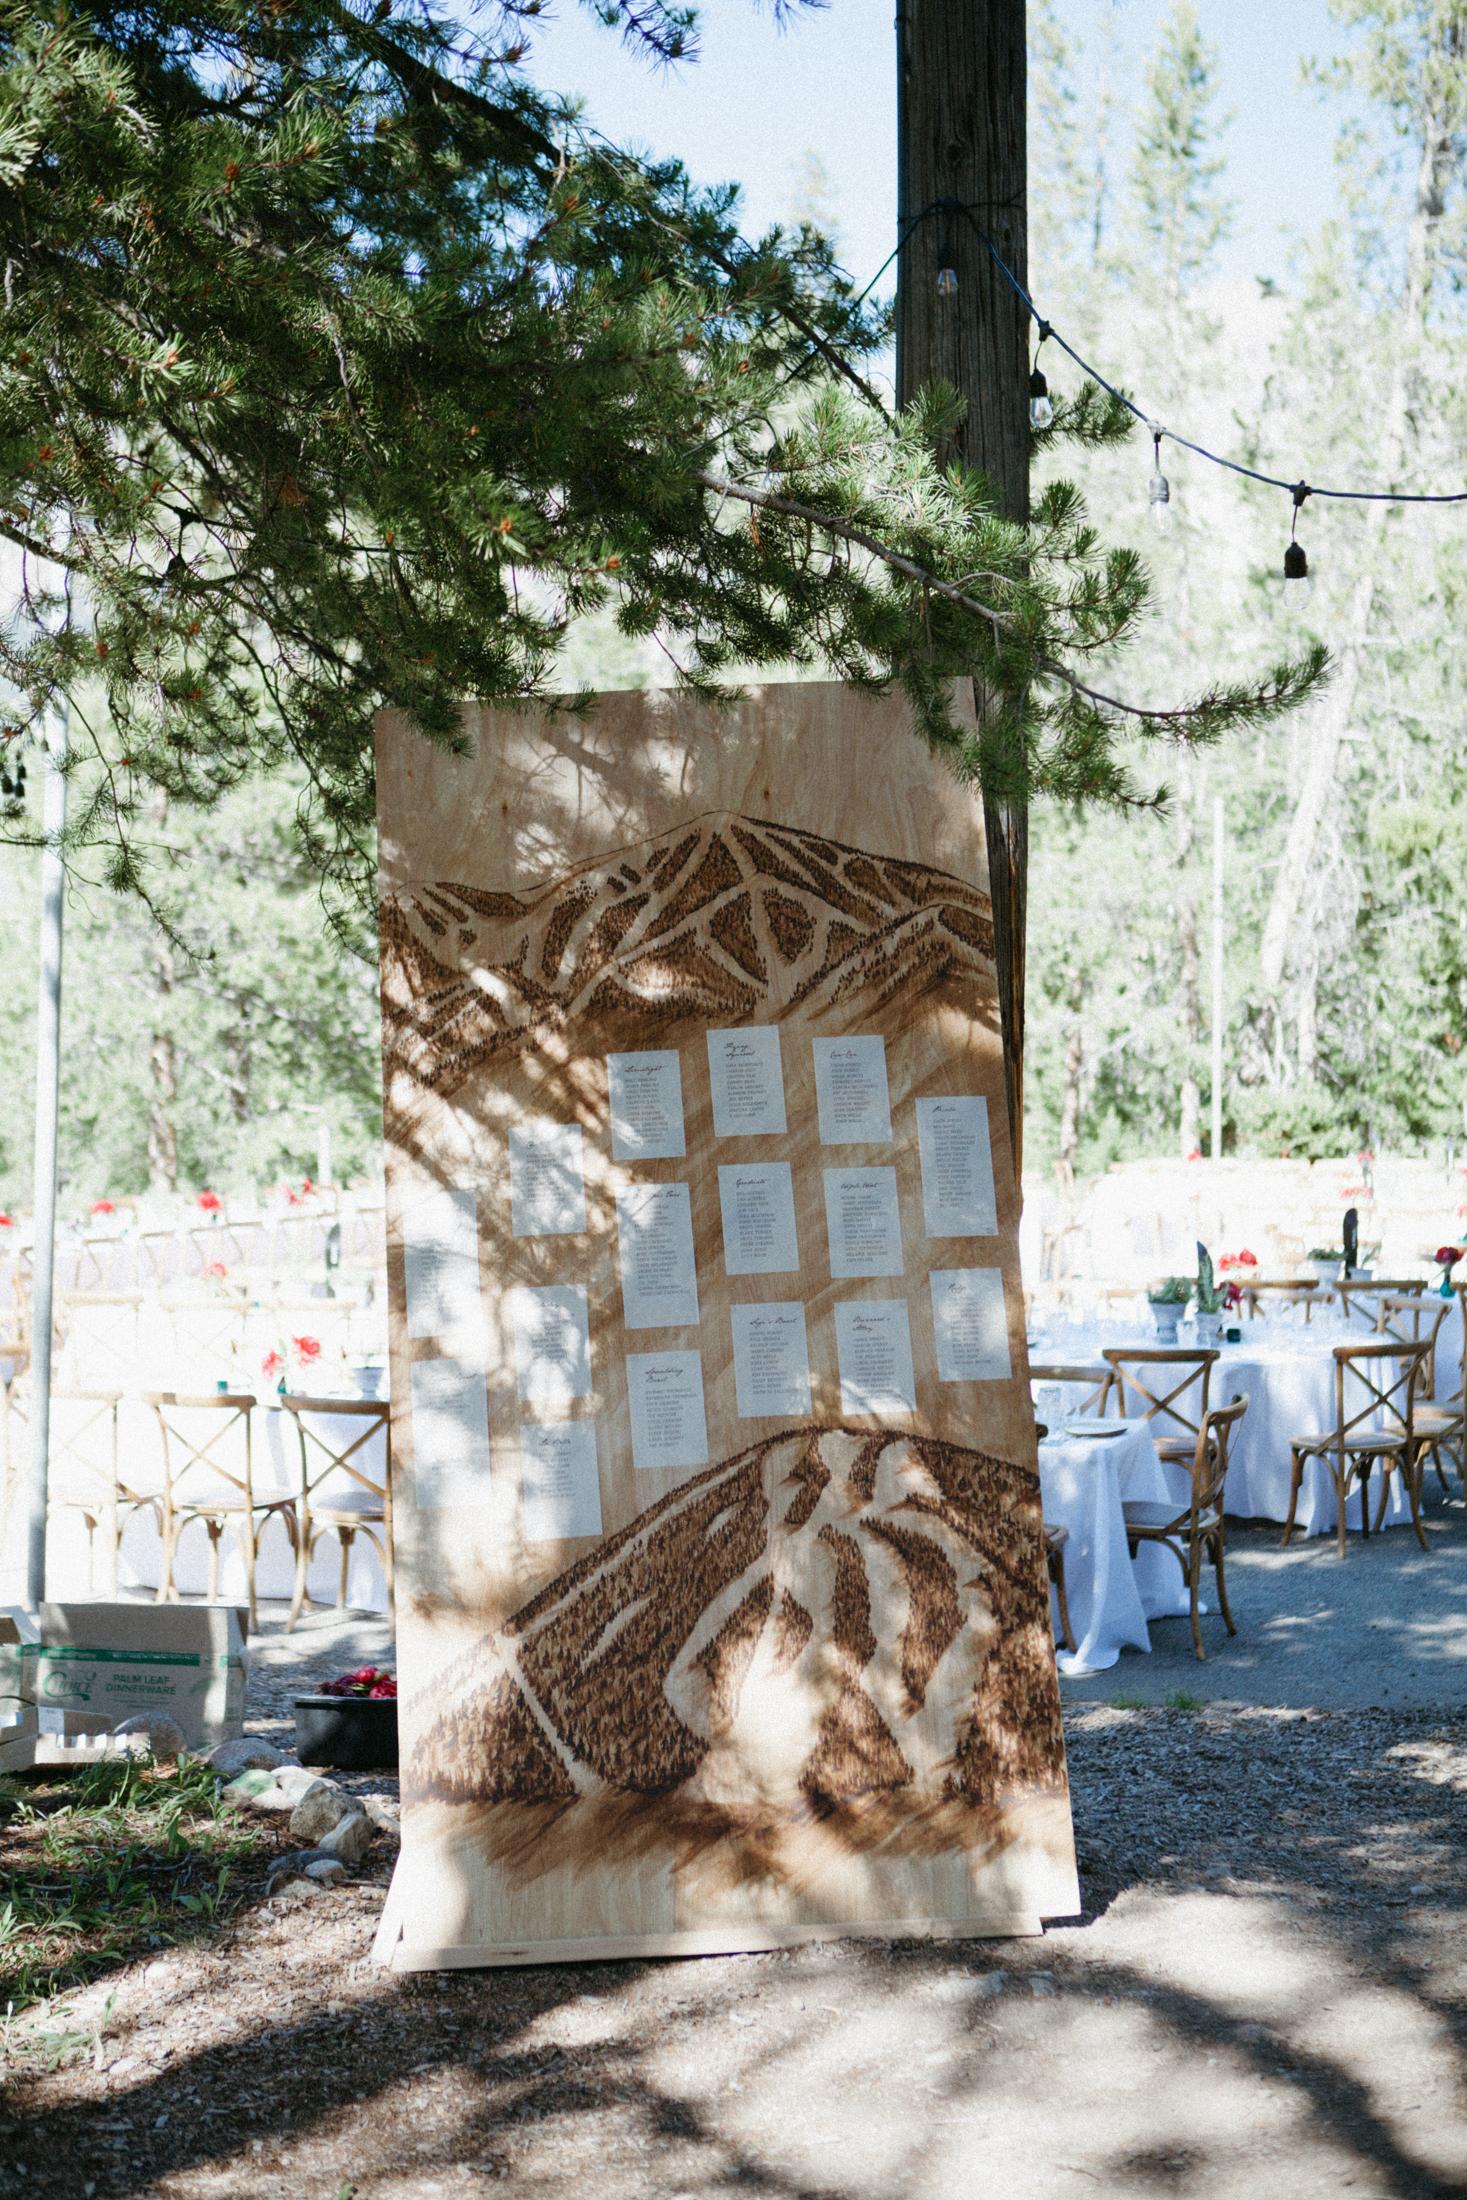 idaho-4h-camp-wedding-christinemarie-95.jpg